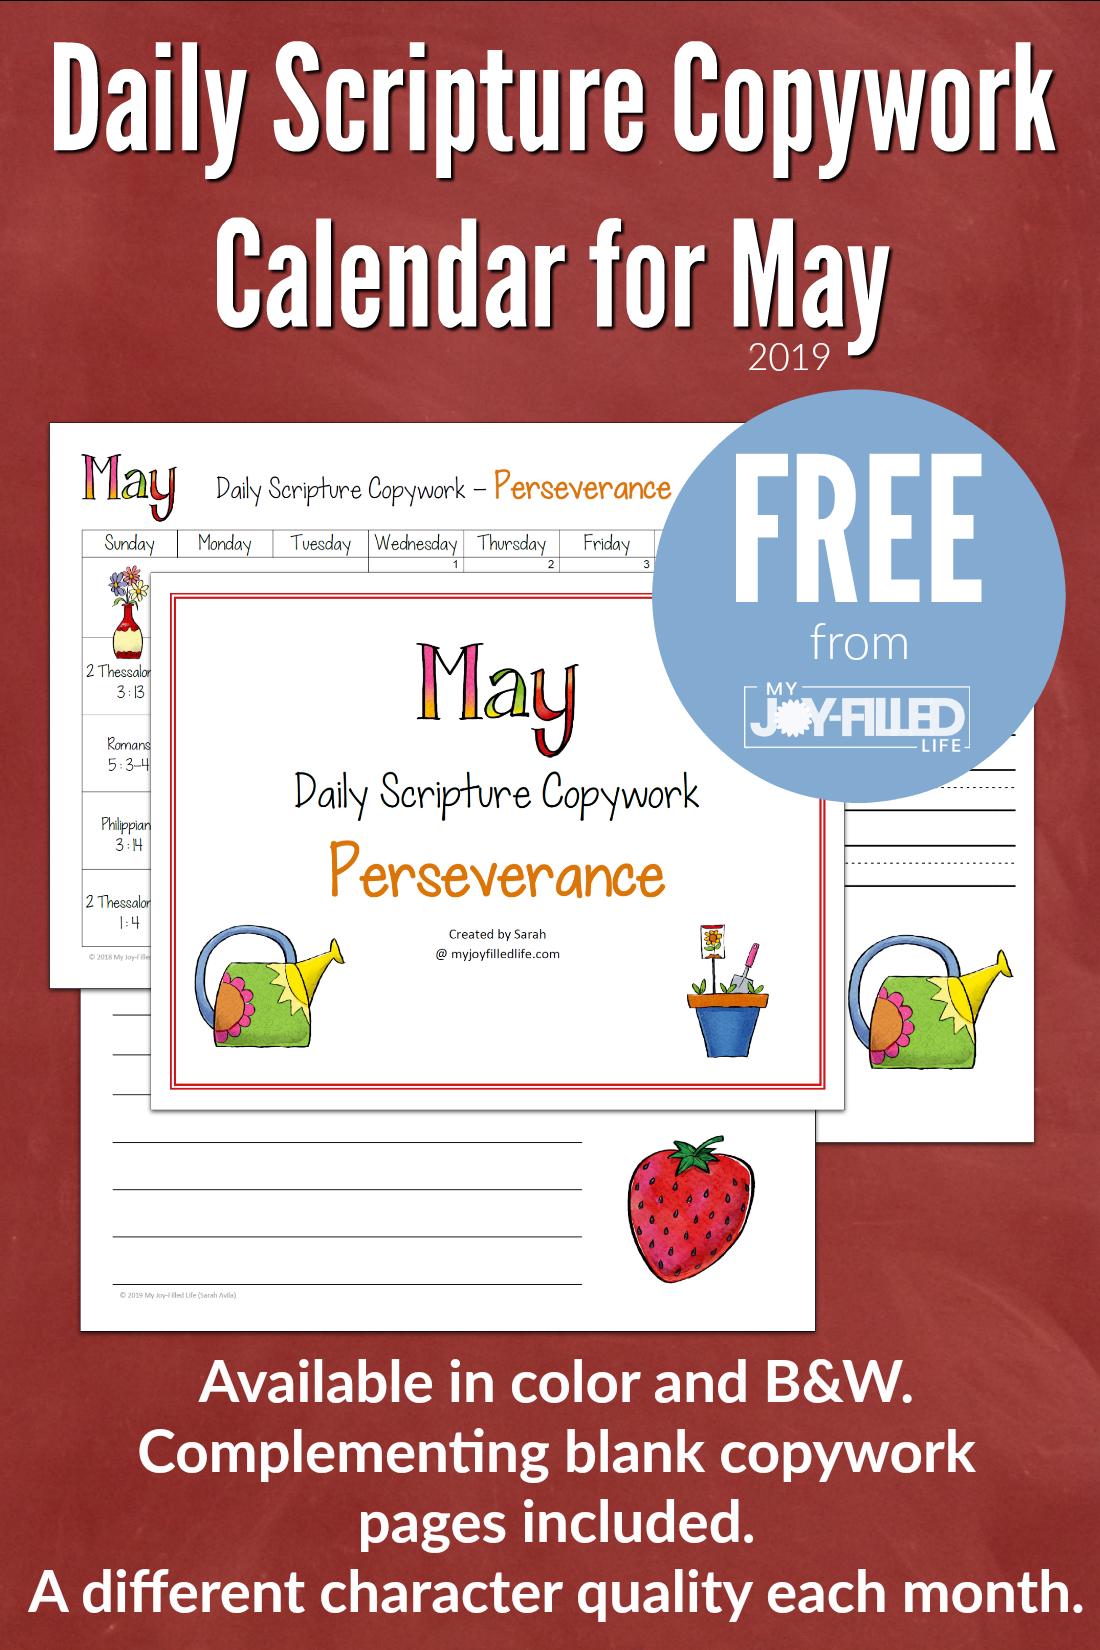 Daily Scripture Copywork Calendar For May